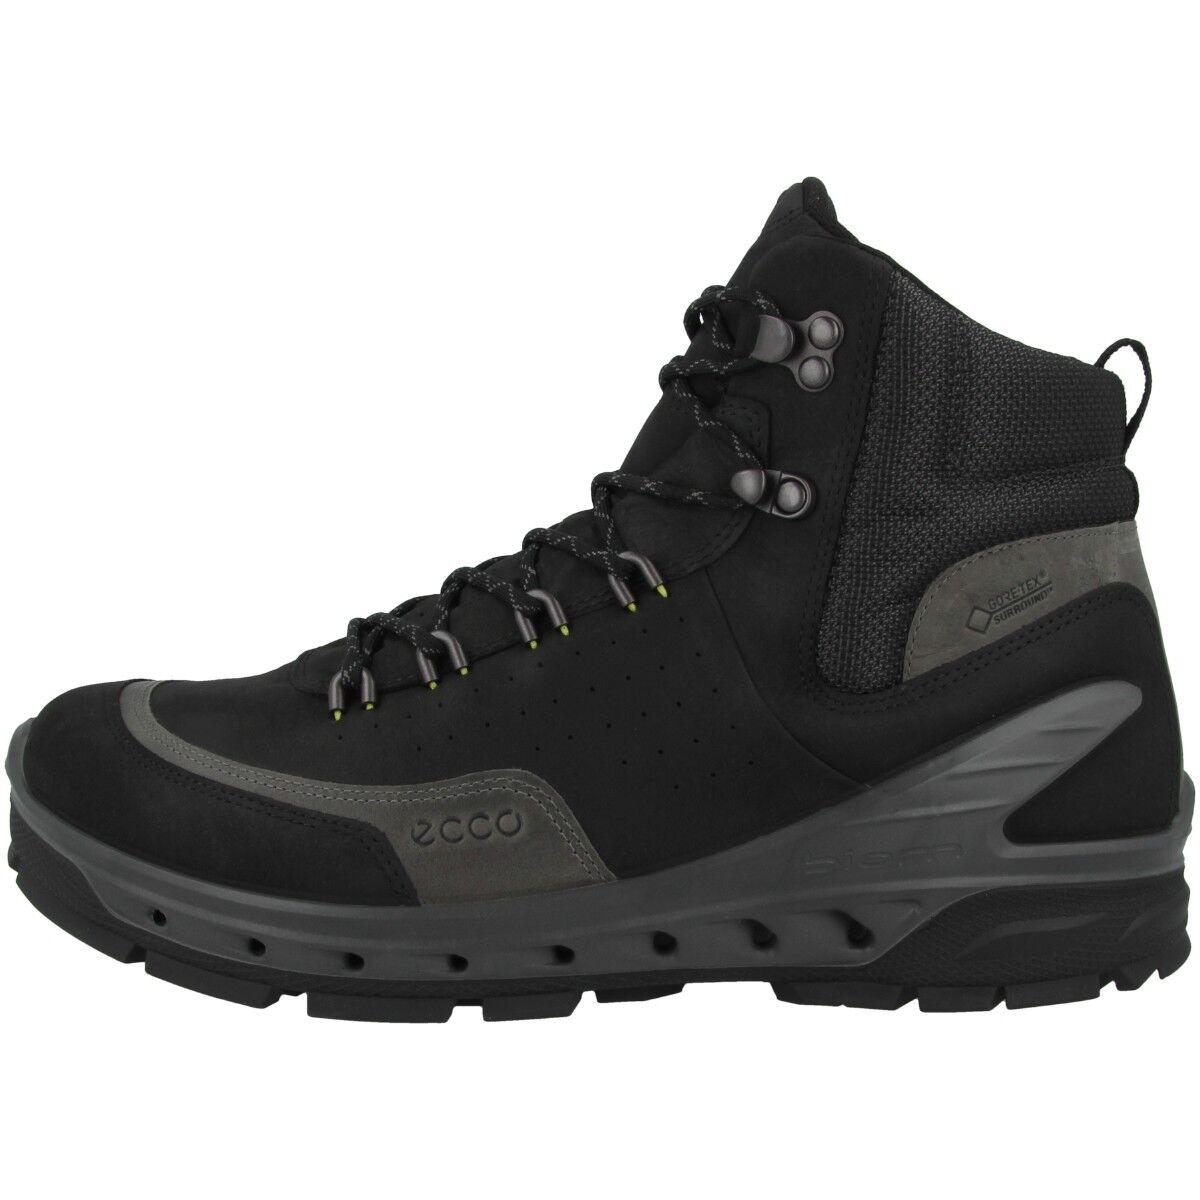 Ecco Biom Venture Tr. Calhan Mid GTX Gore-Tex zapatos Naturale Movimento